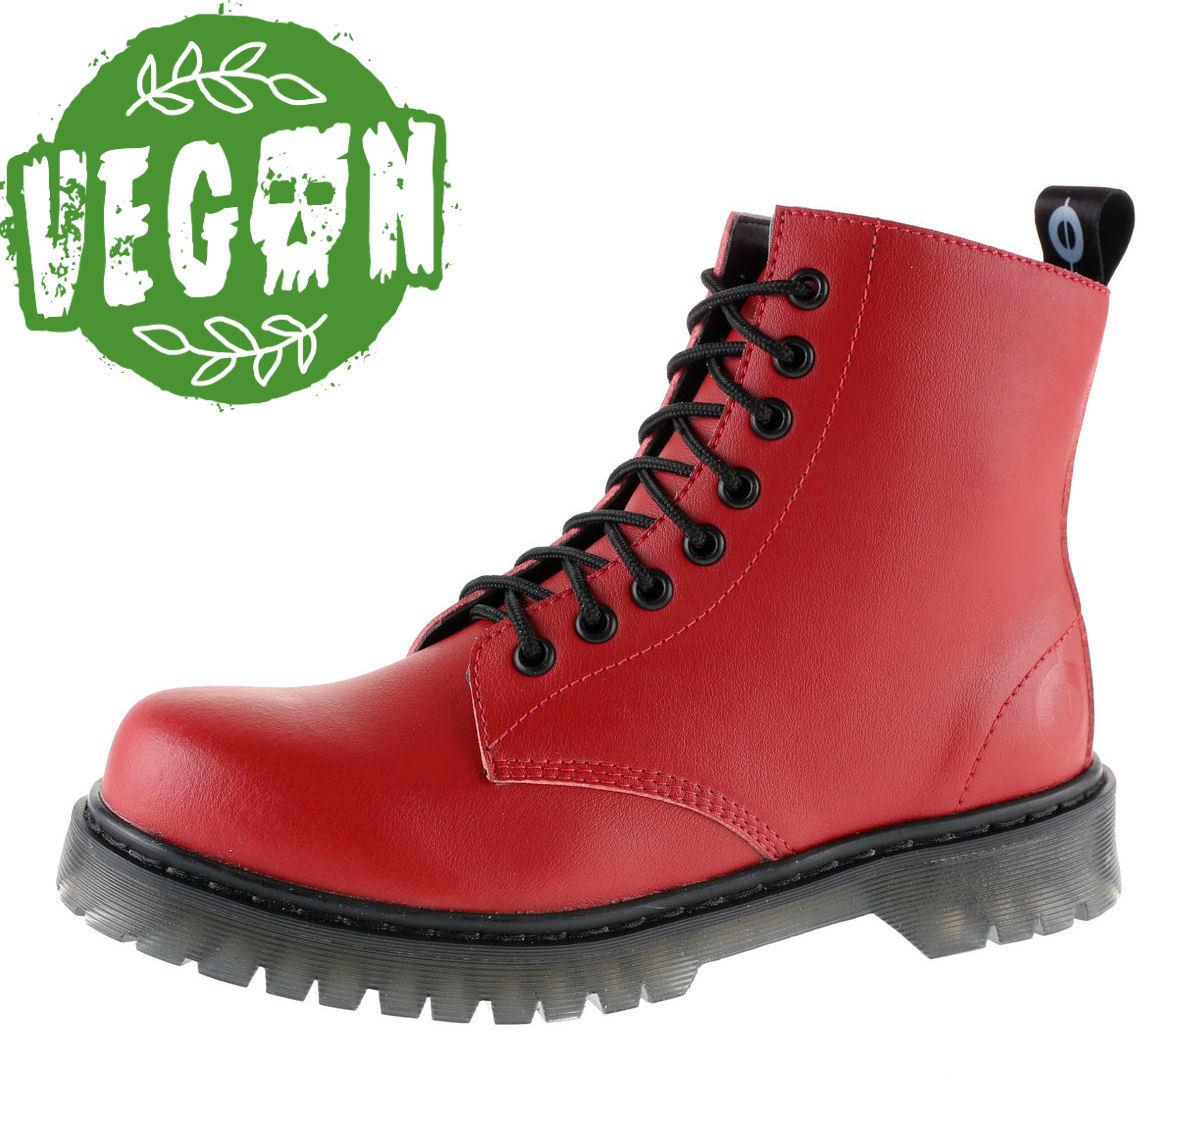 2edb0f022d3 boty dámské 8 dírkové ALTERCORE - Vegetarian - Red - 651 - metalshop.cz